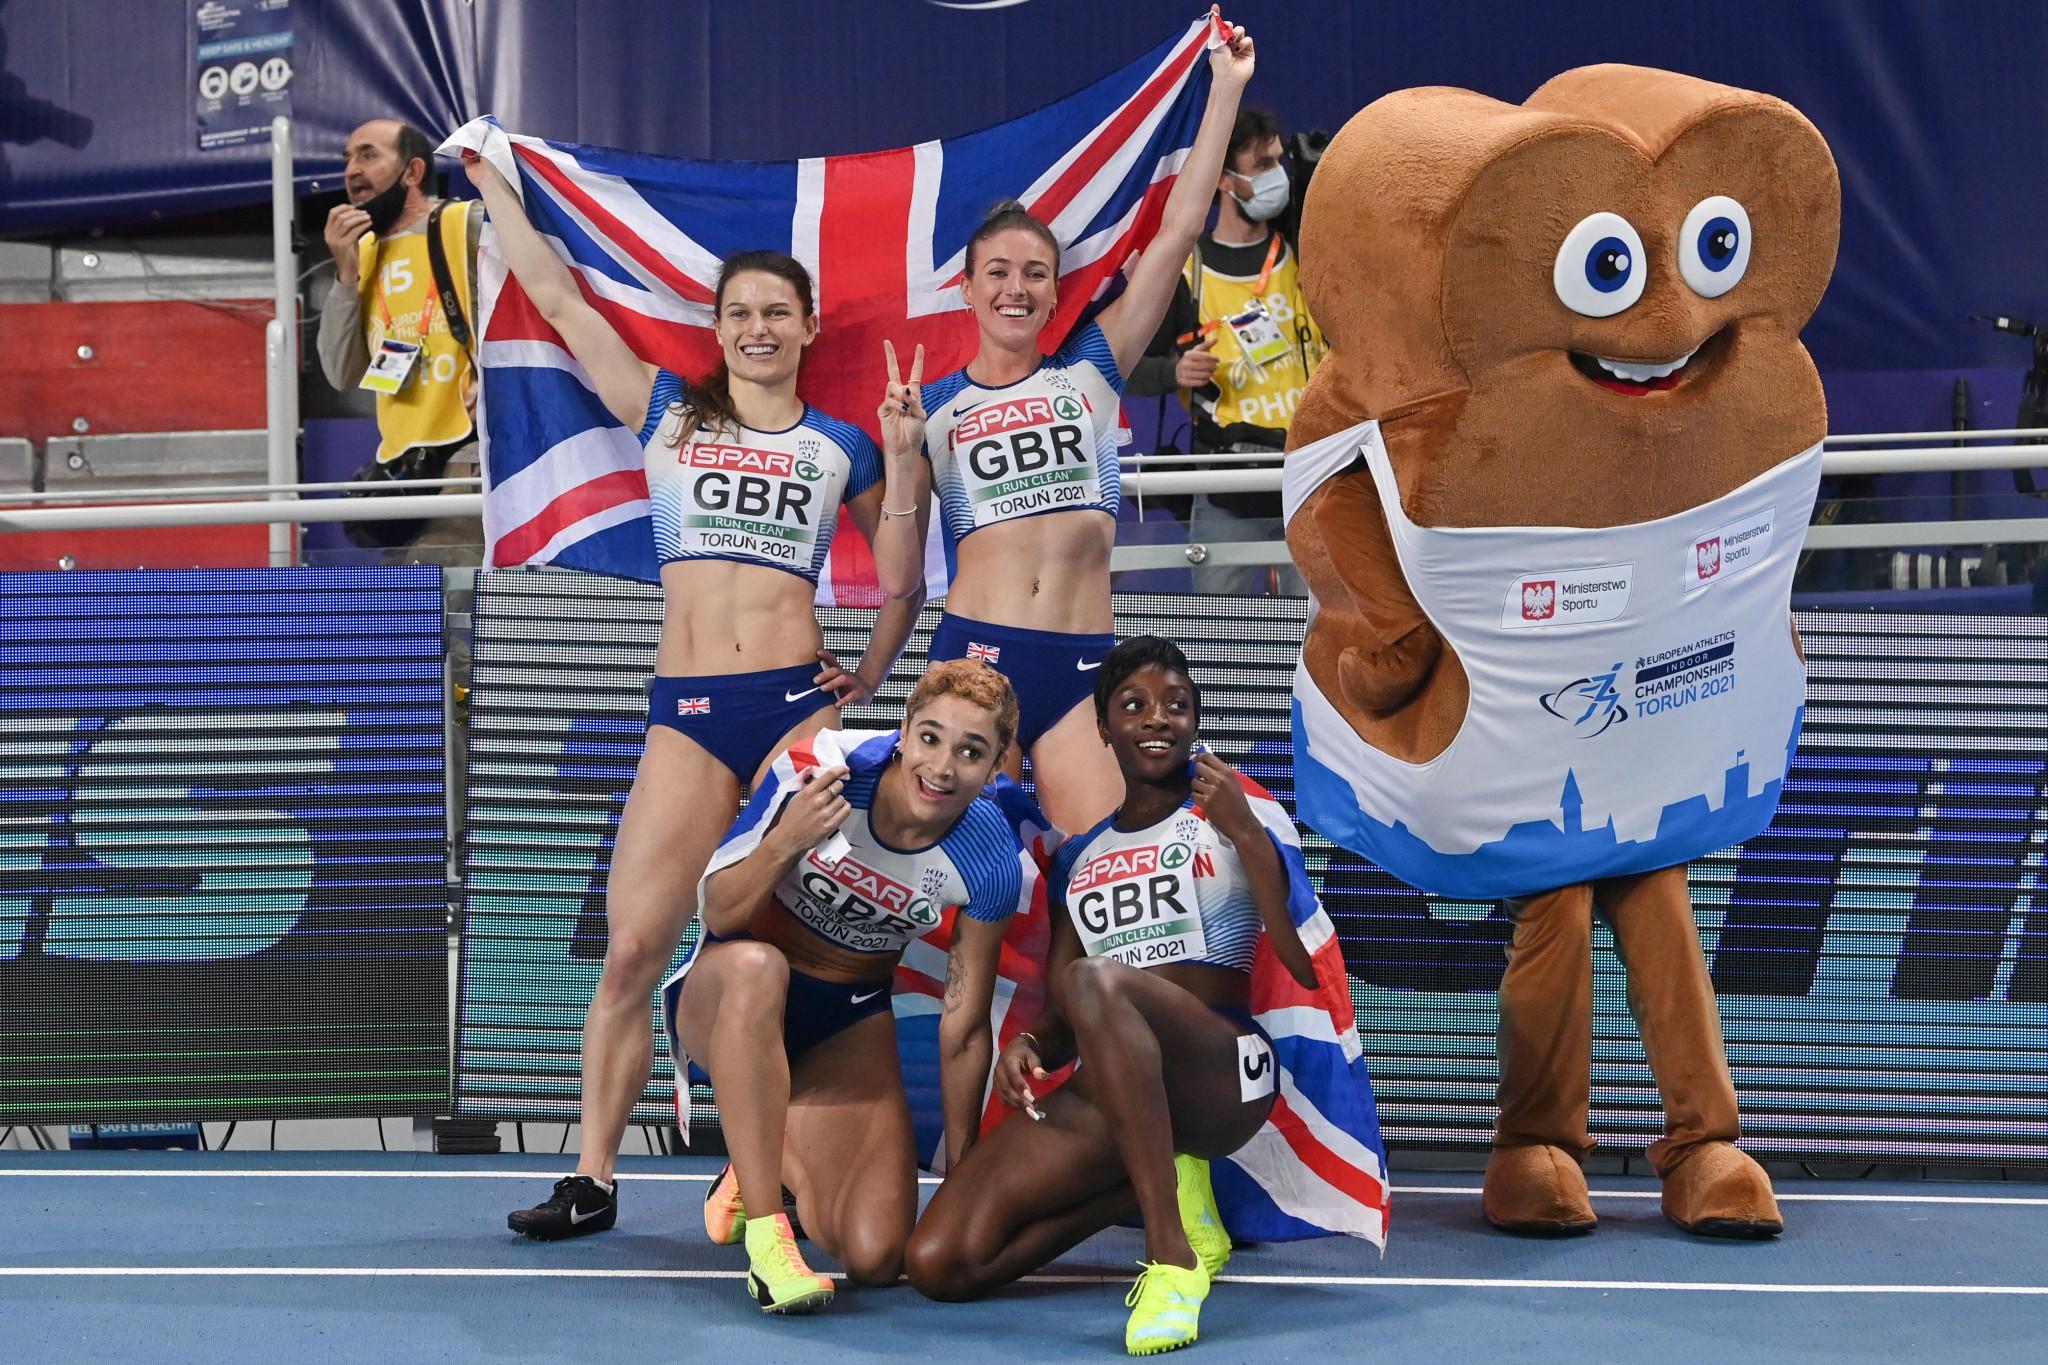 British Athletics raises COVID-19 protocol concerns to European Athletics after spate of cases